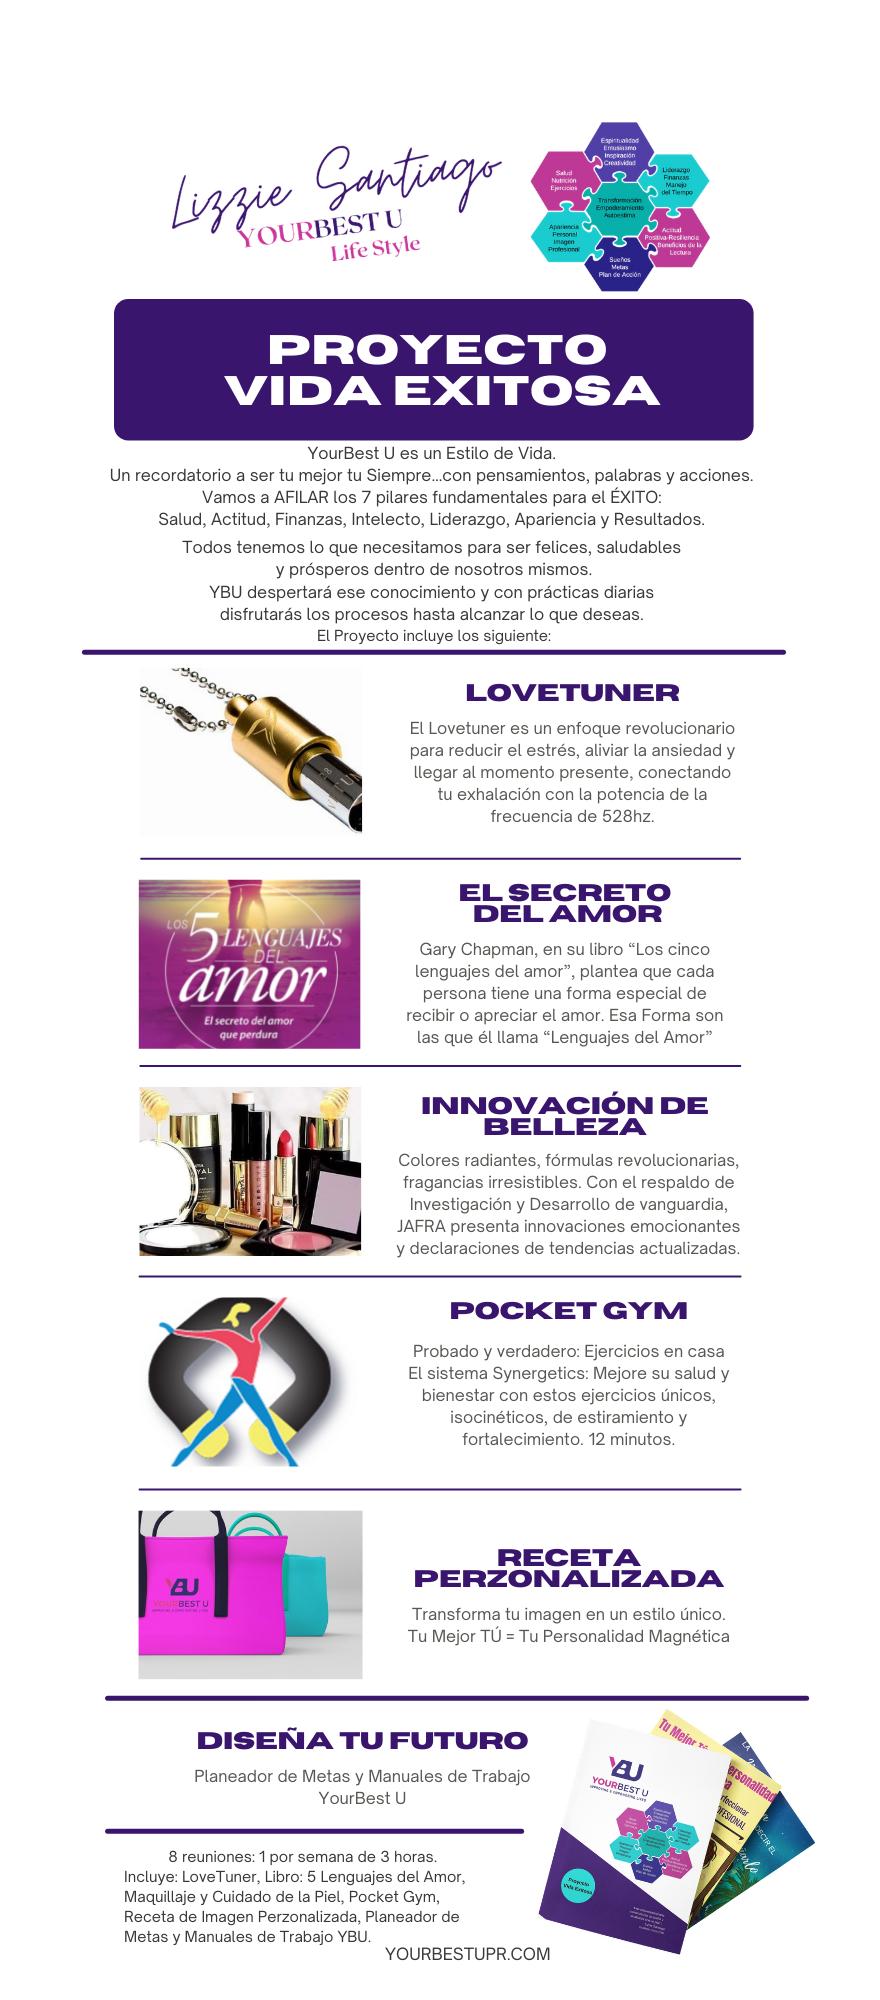 Proyecto Vida Exitosa 1 (1).png